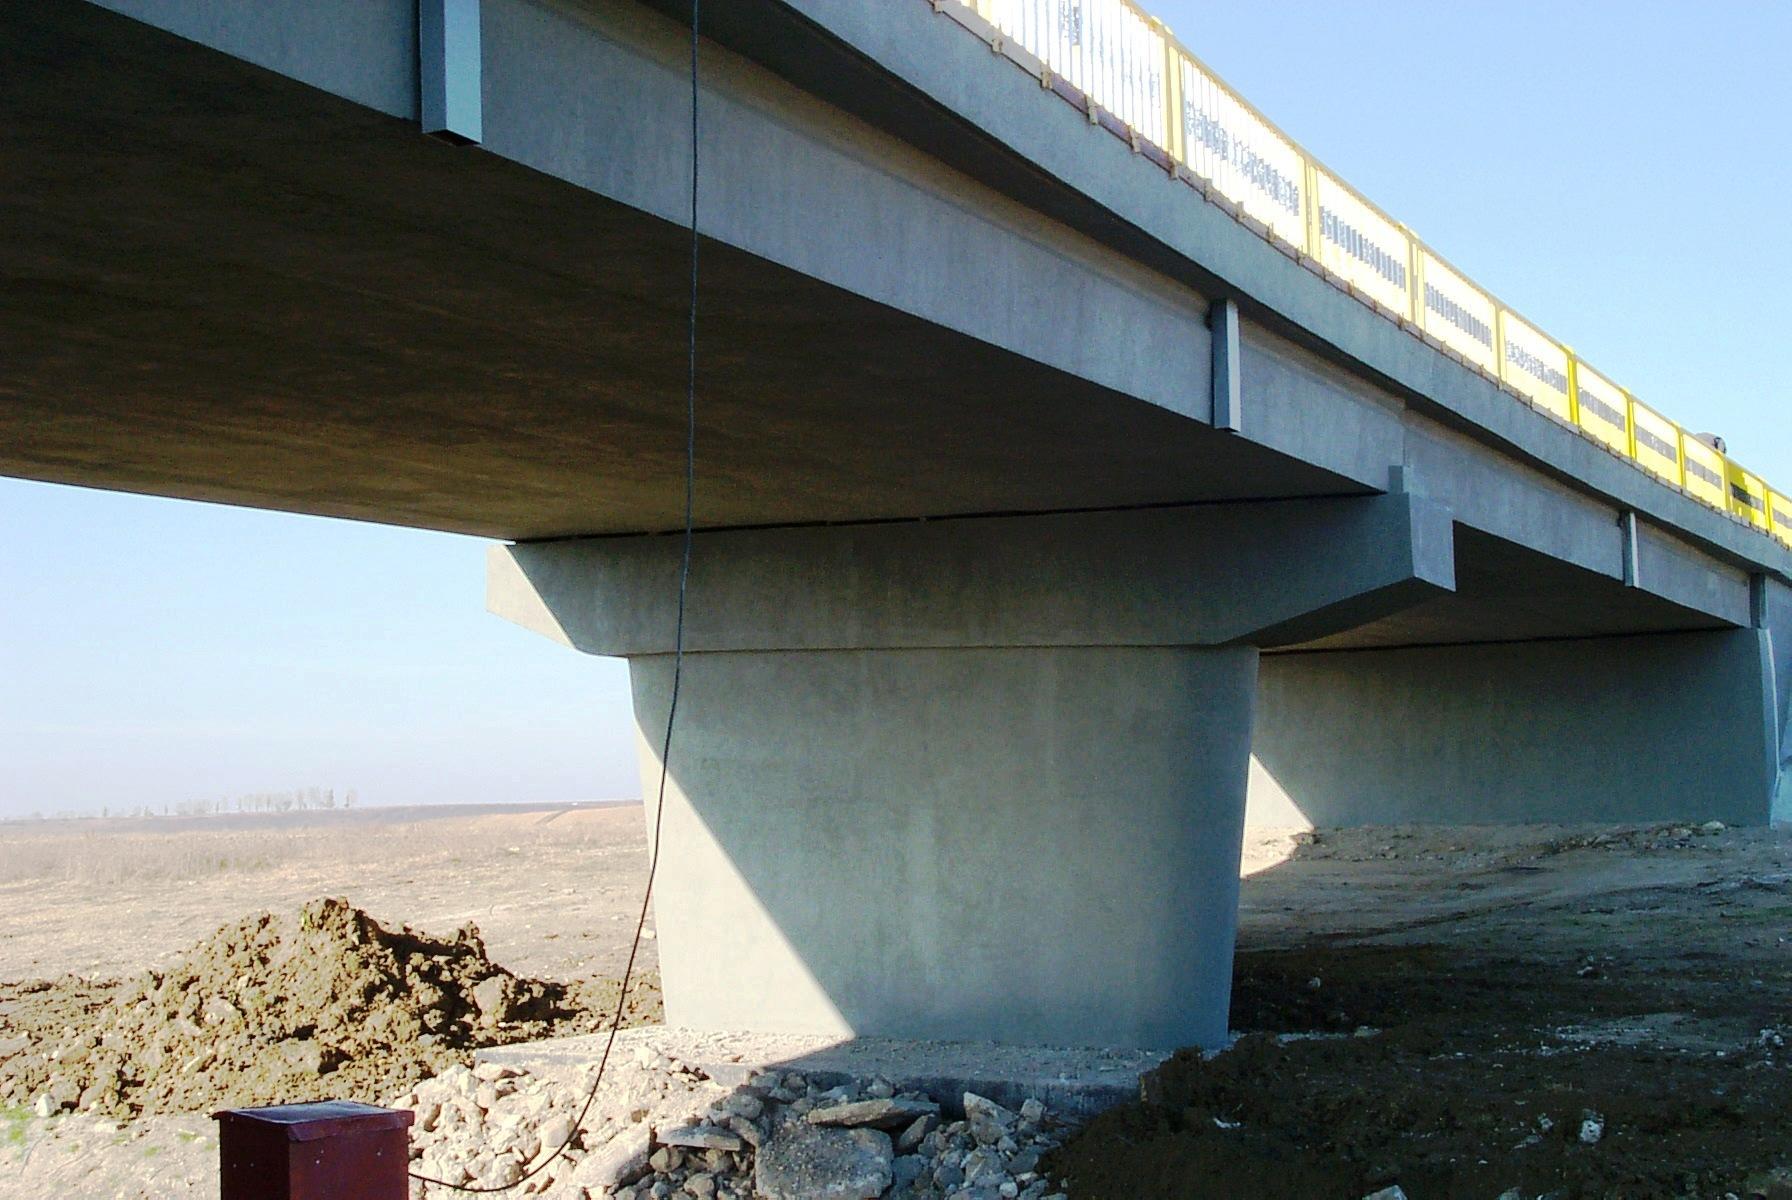 Reparatii pod (DN2), Km. 33 - 028, peste raul Calnistea MAPEI - Poza 124